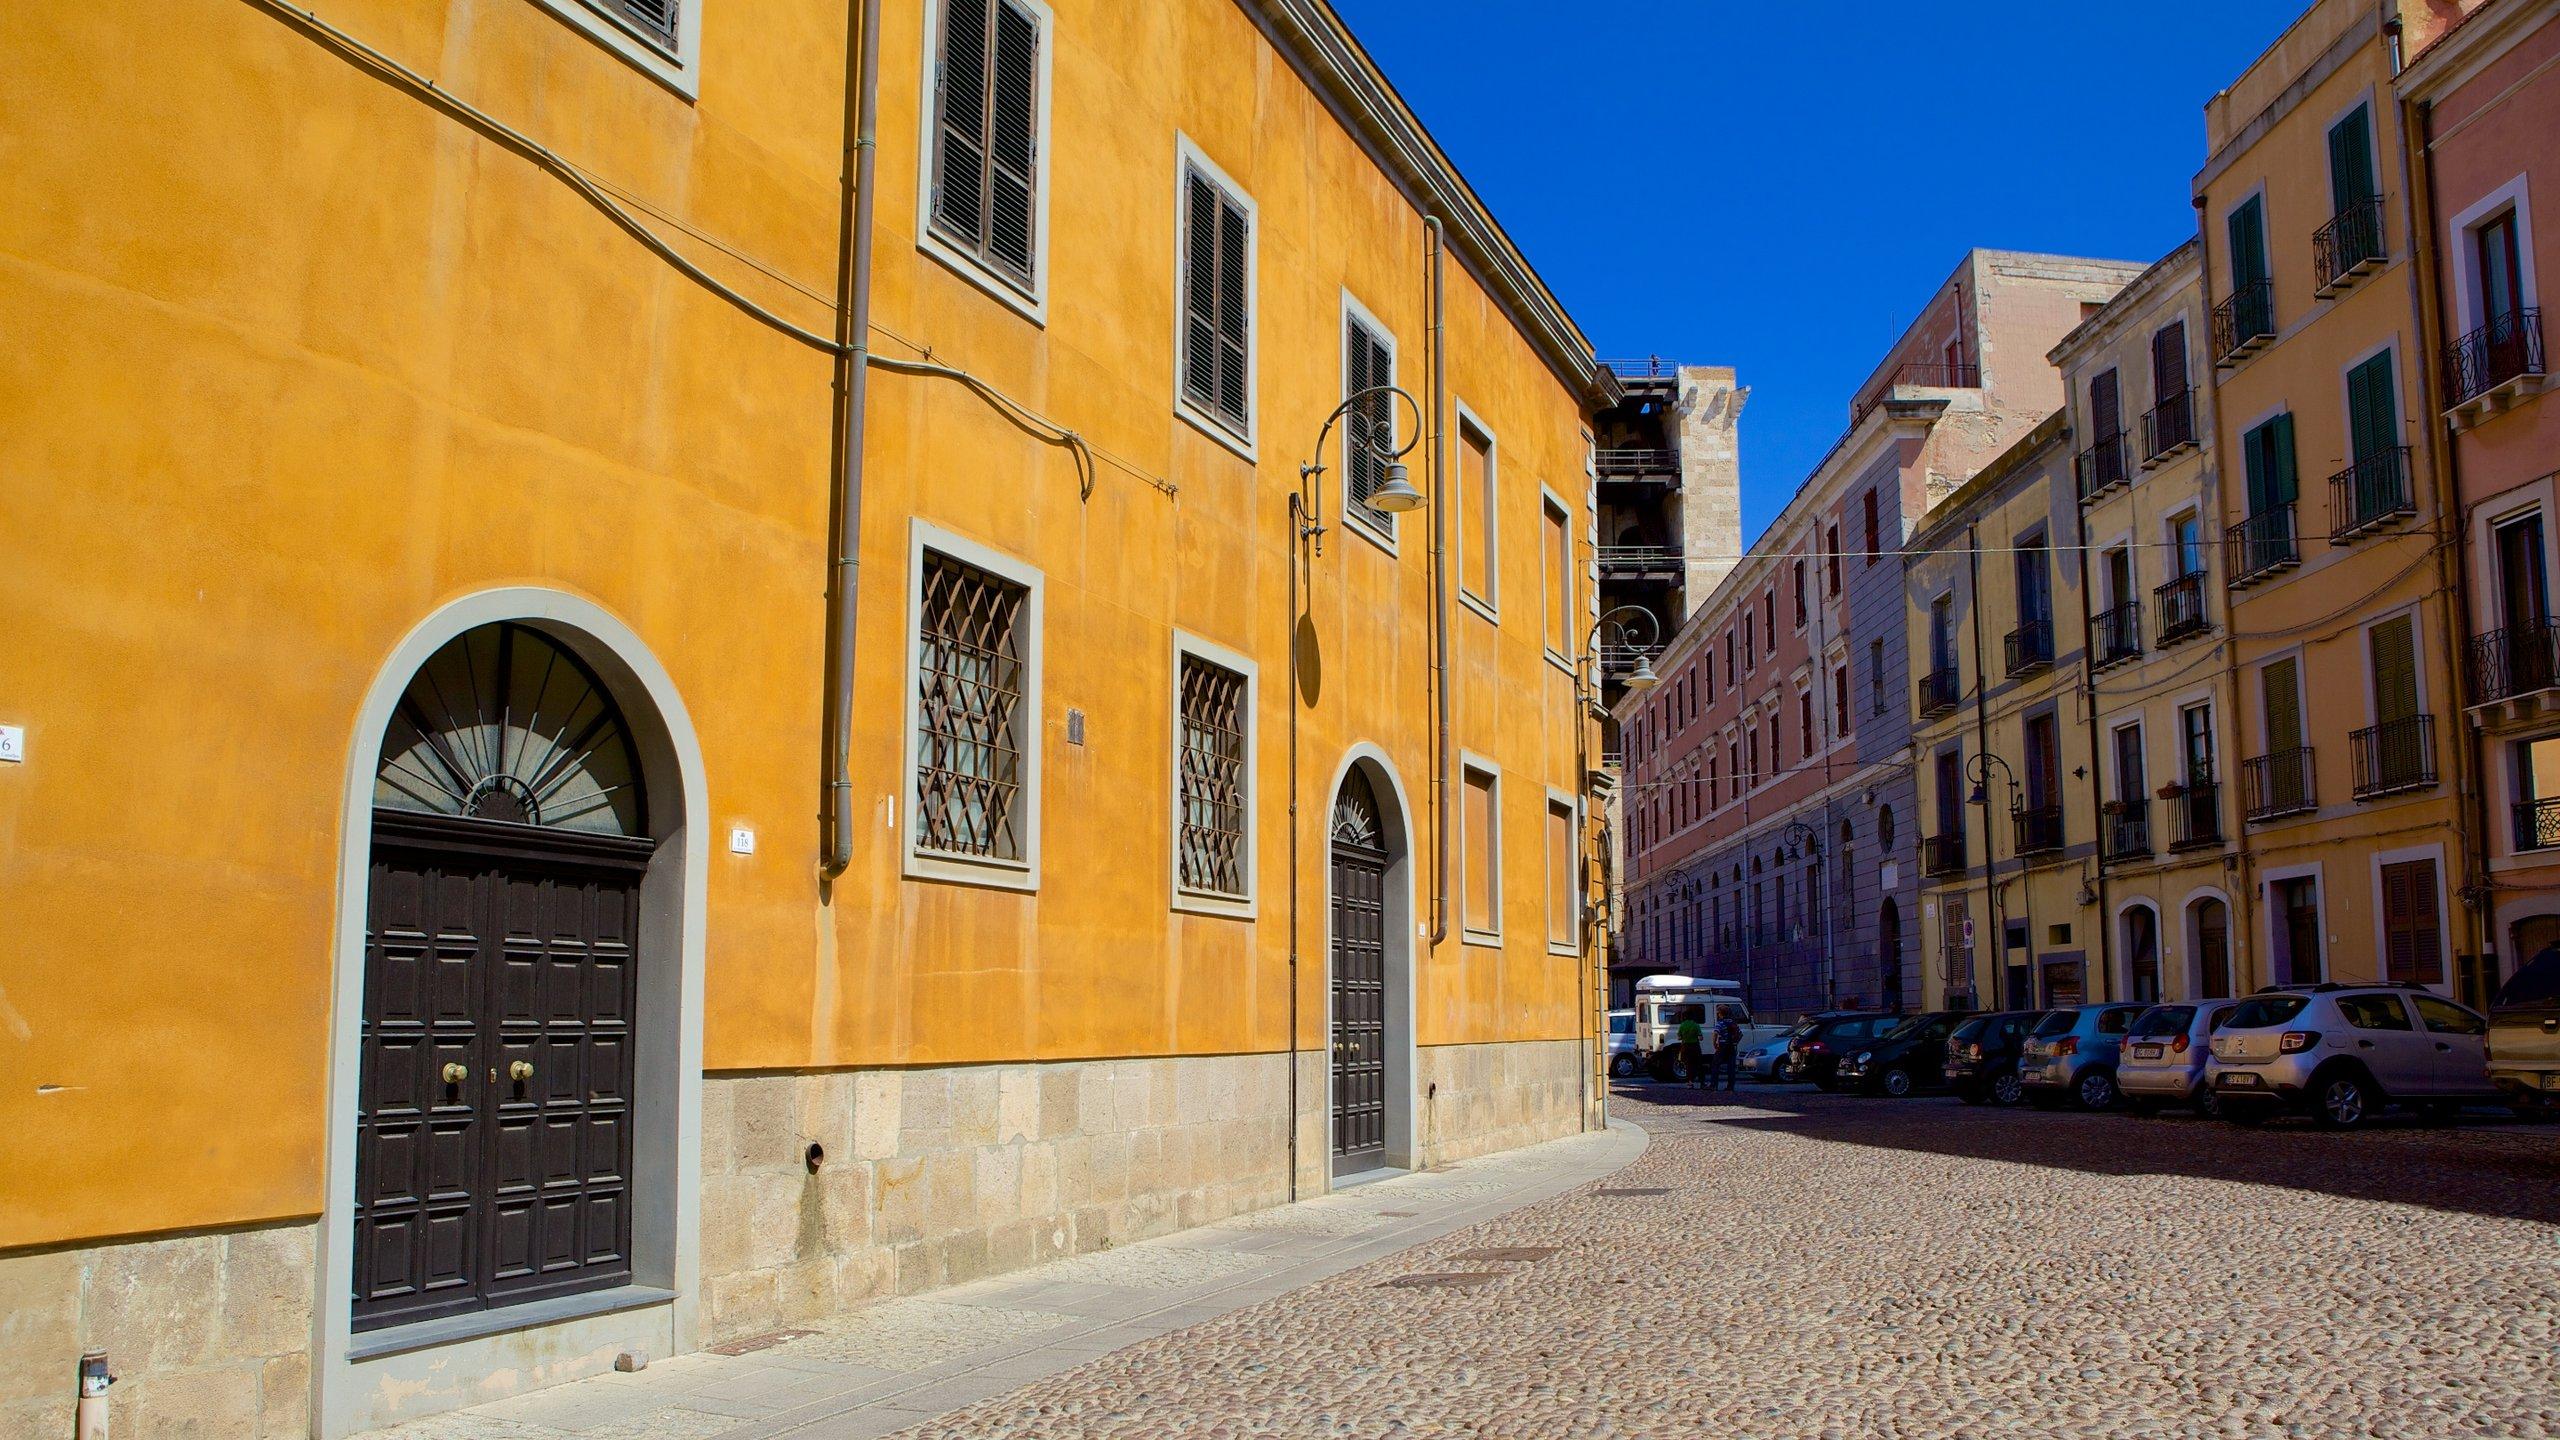 Metropolitan City of Cagliari, Sardinia, Italy